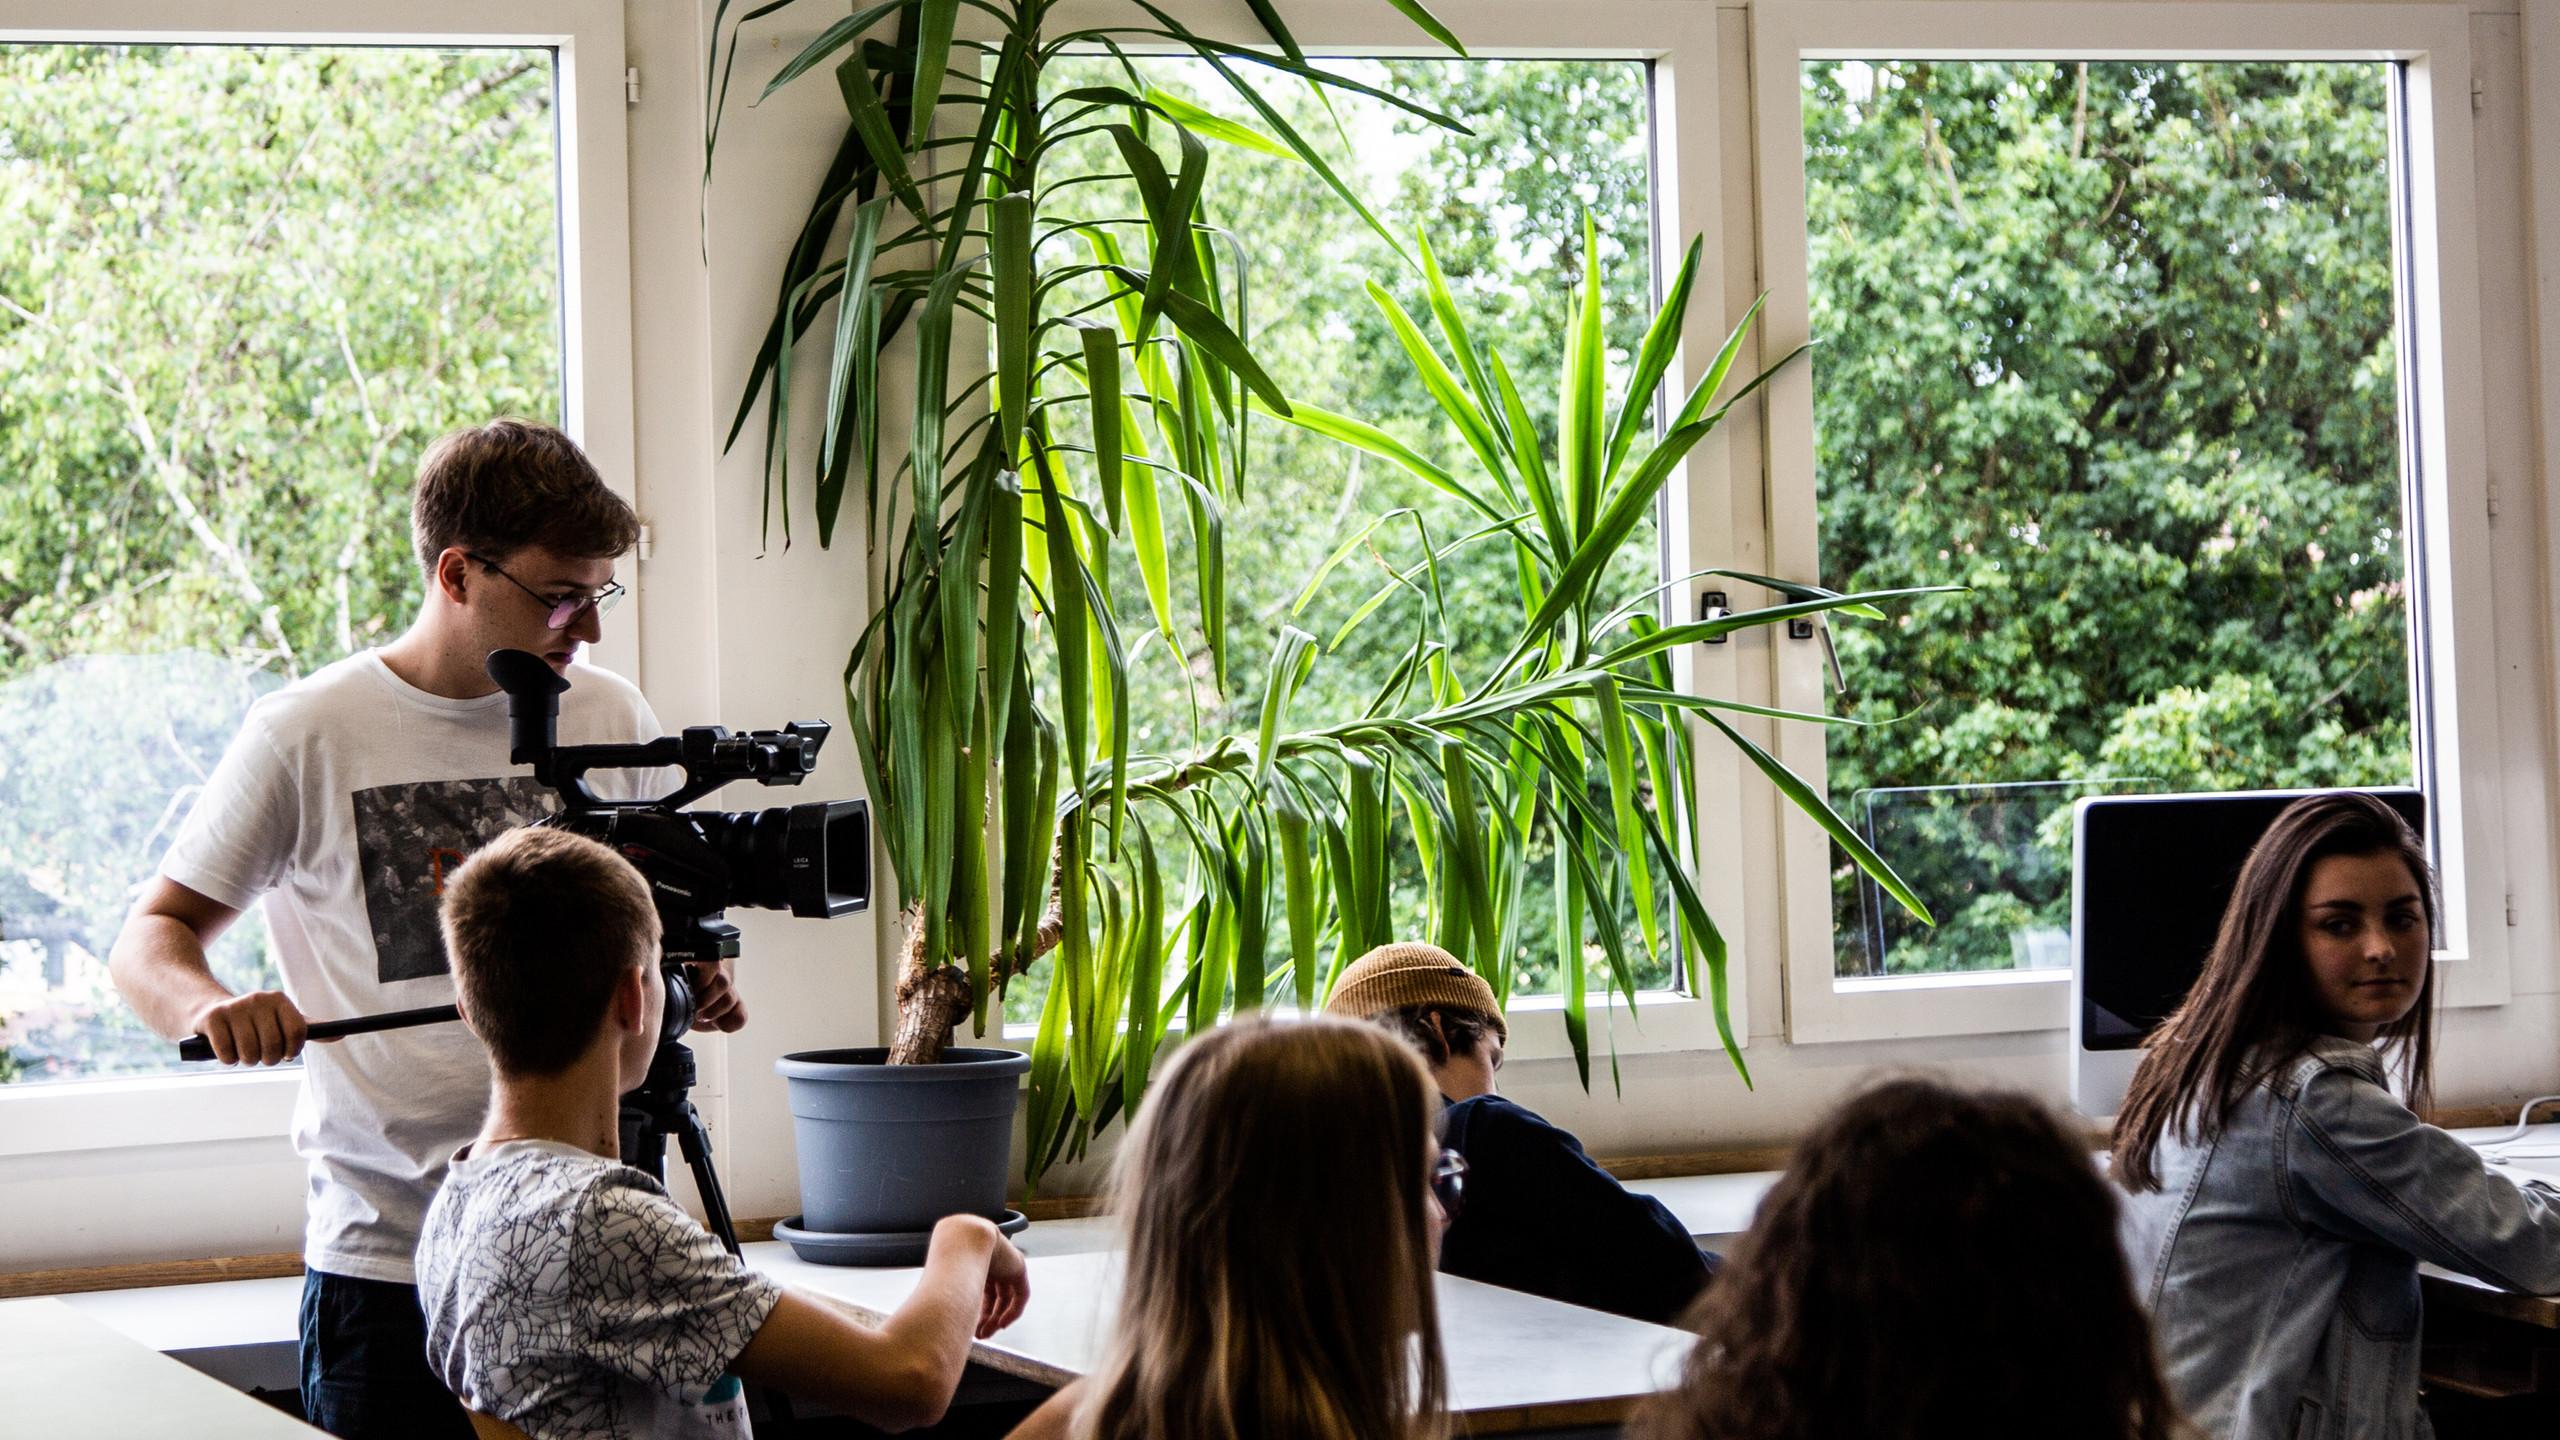 Fotos_Kurzfilme_Donnerstag-11